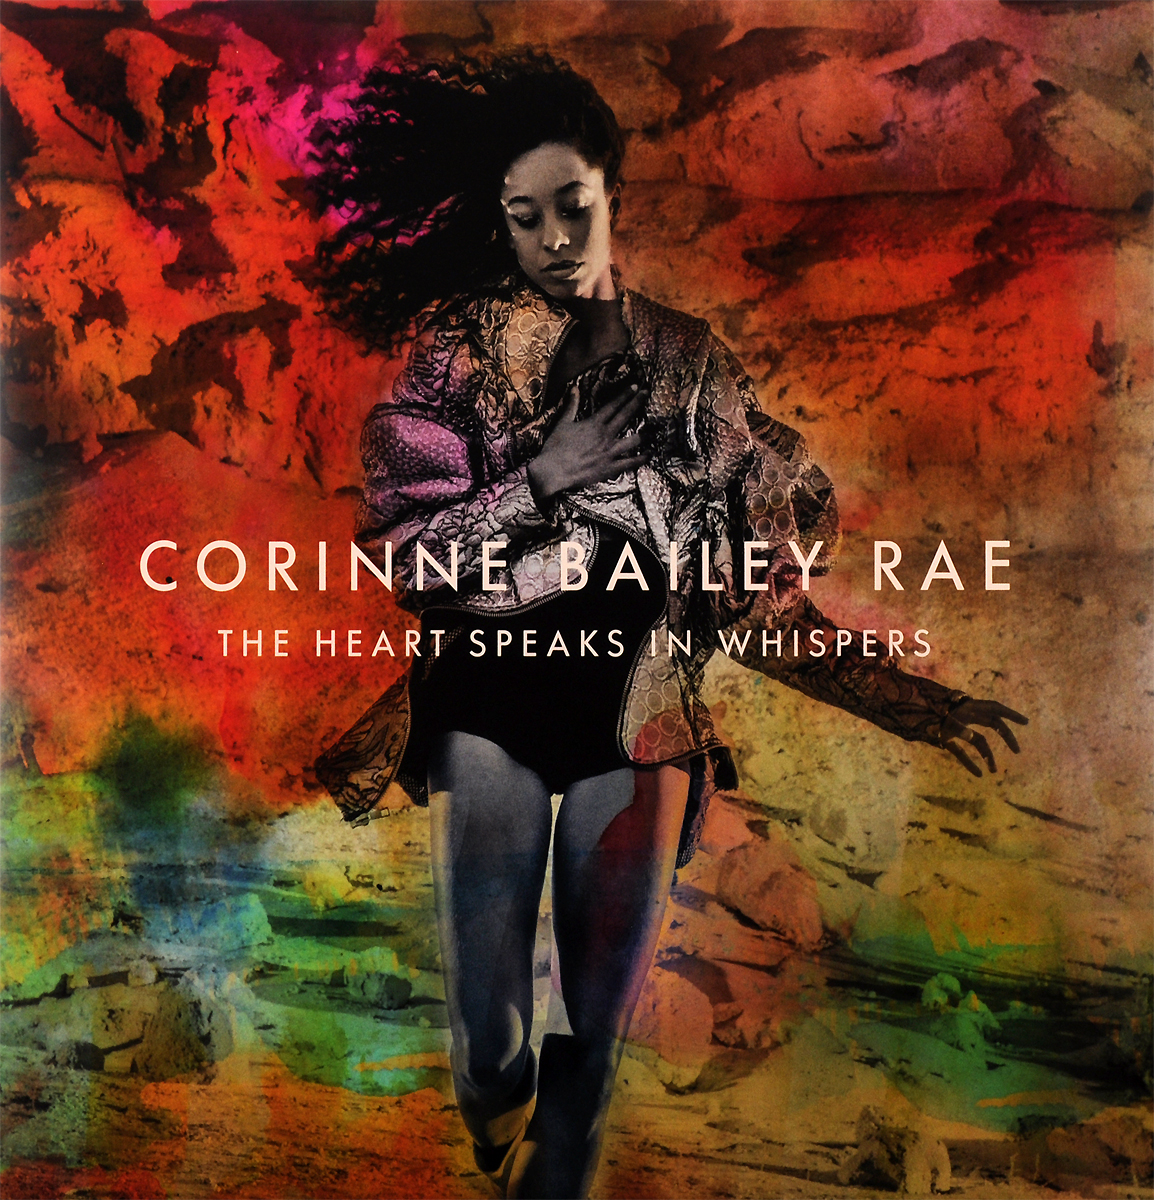 Коринн Бэйли Рэй Corinne Bailey Rae. The Heart Speaks In Whispers (2 LP) недорого